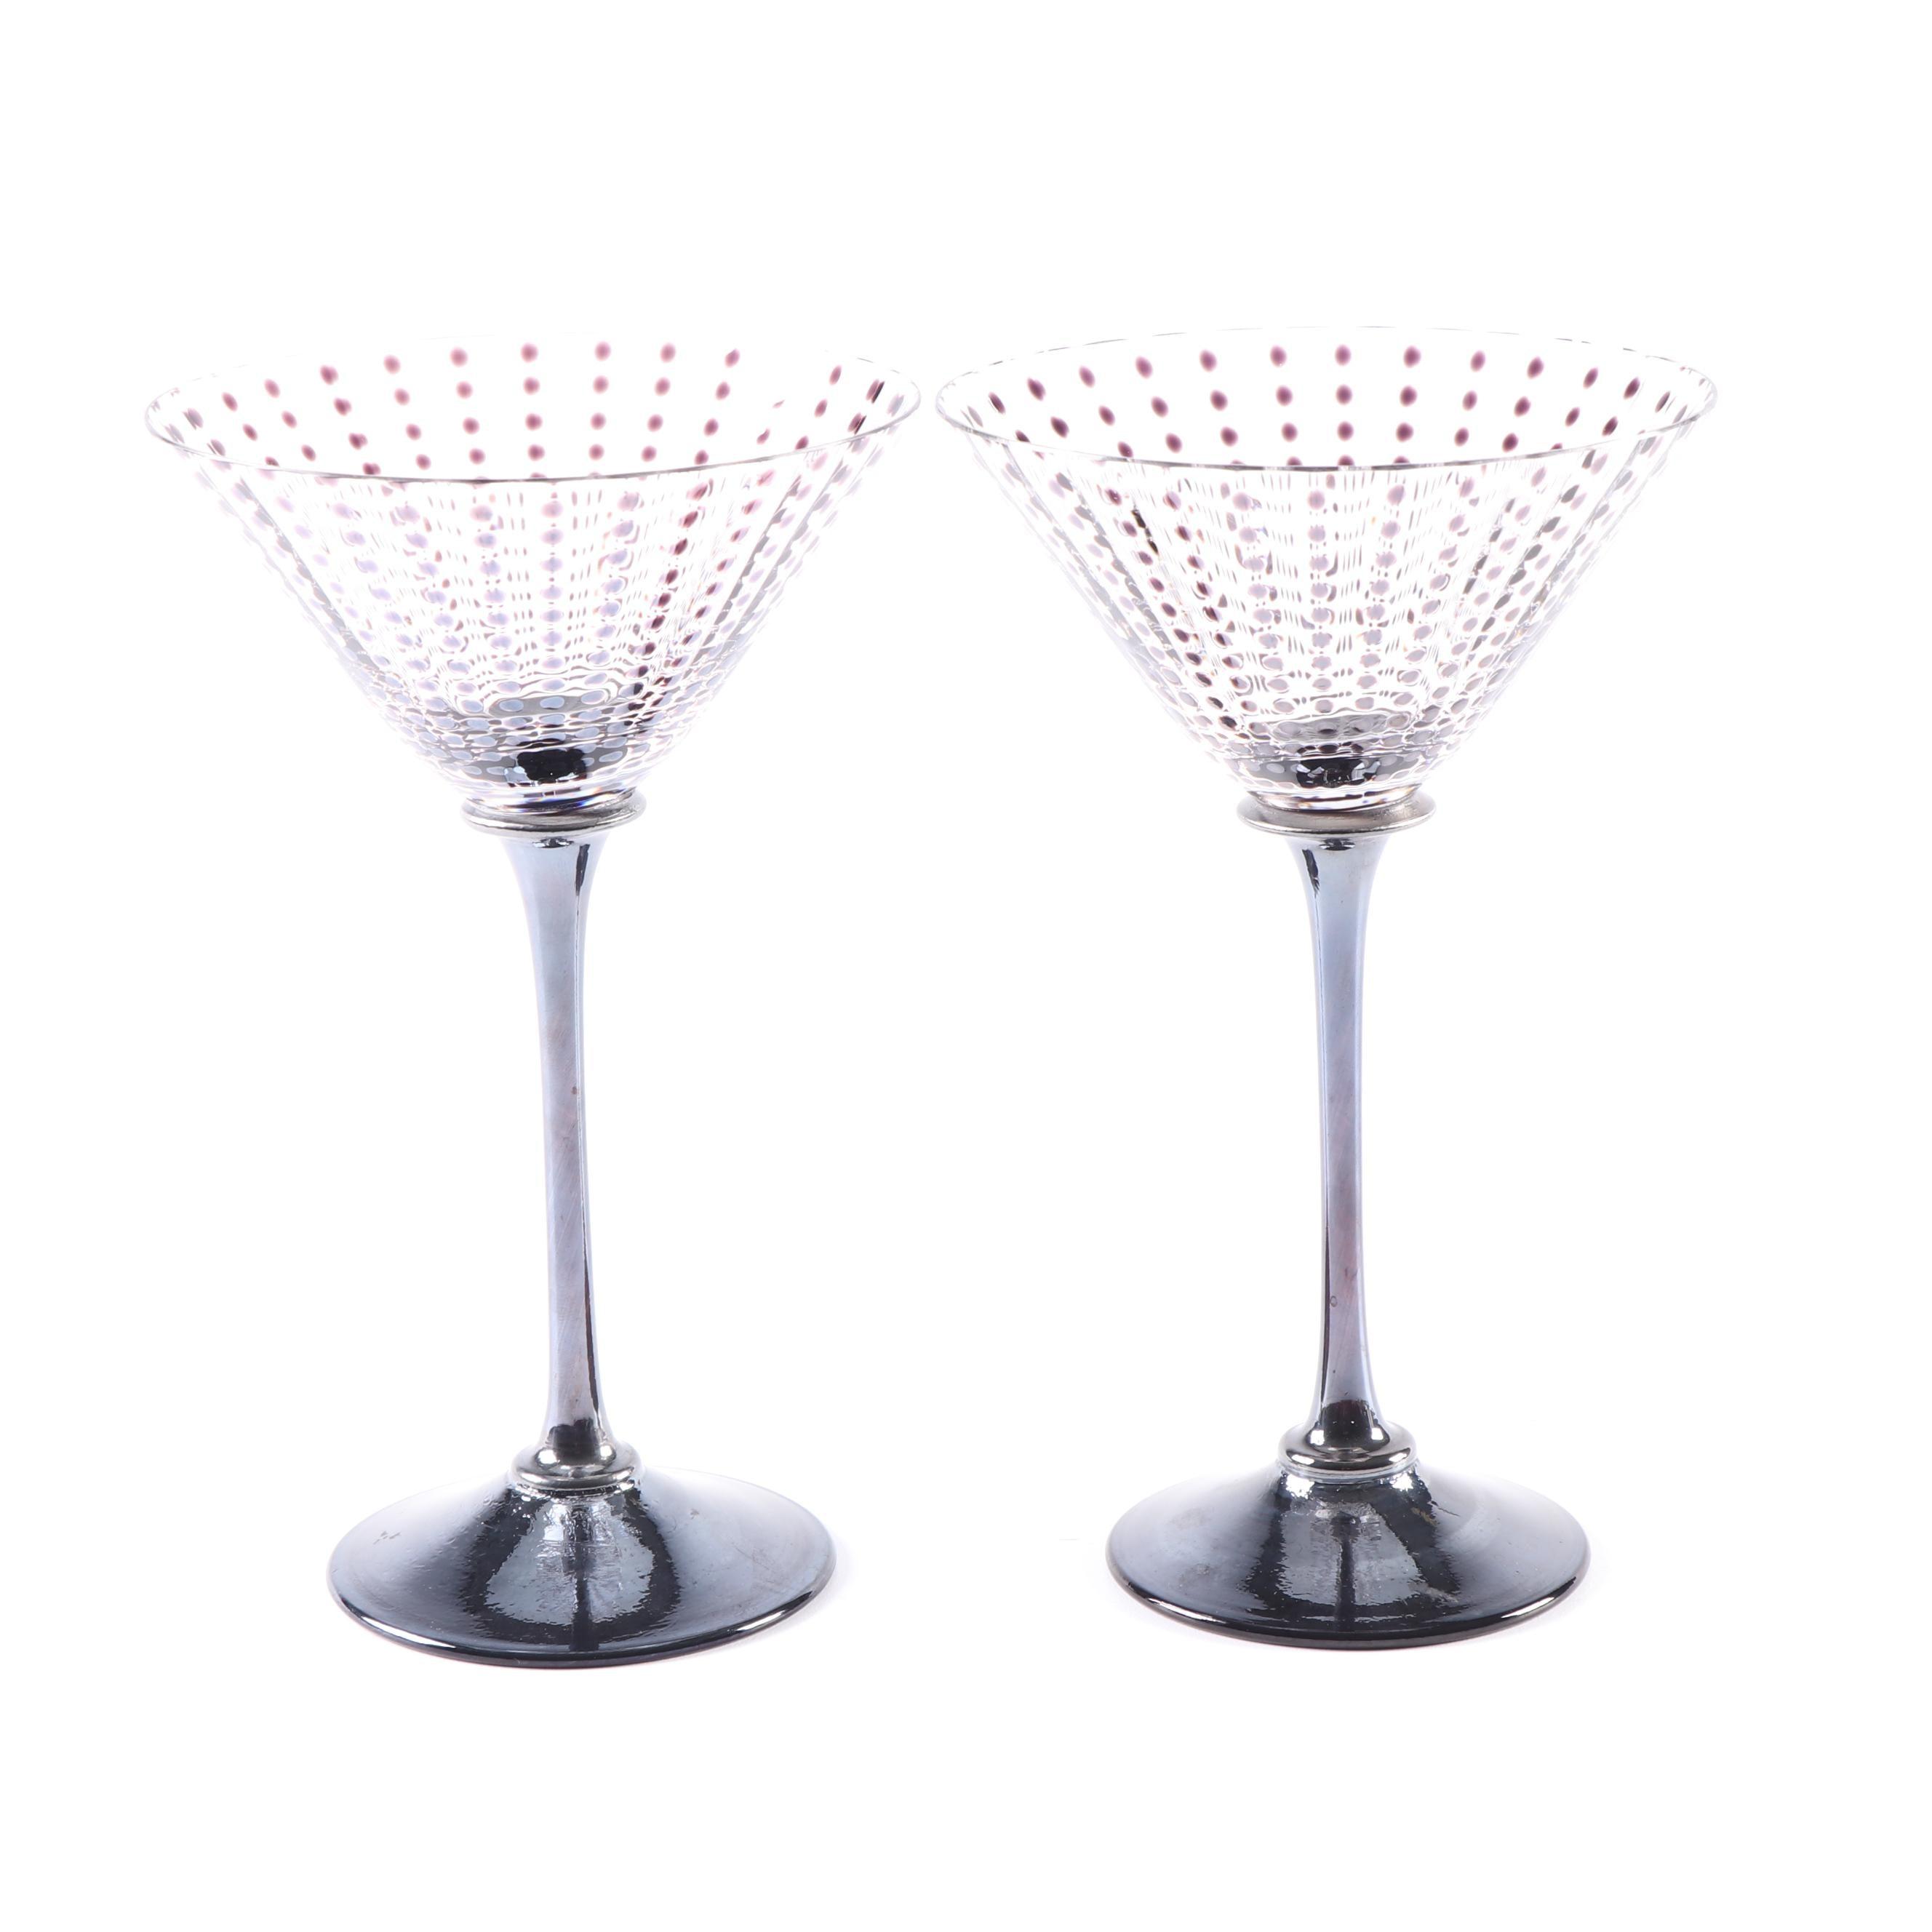 J. Stefanik Martini Glasses